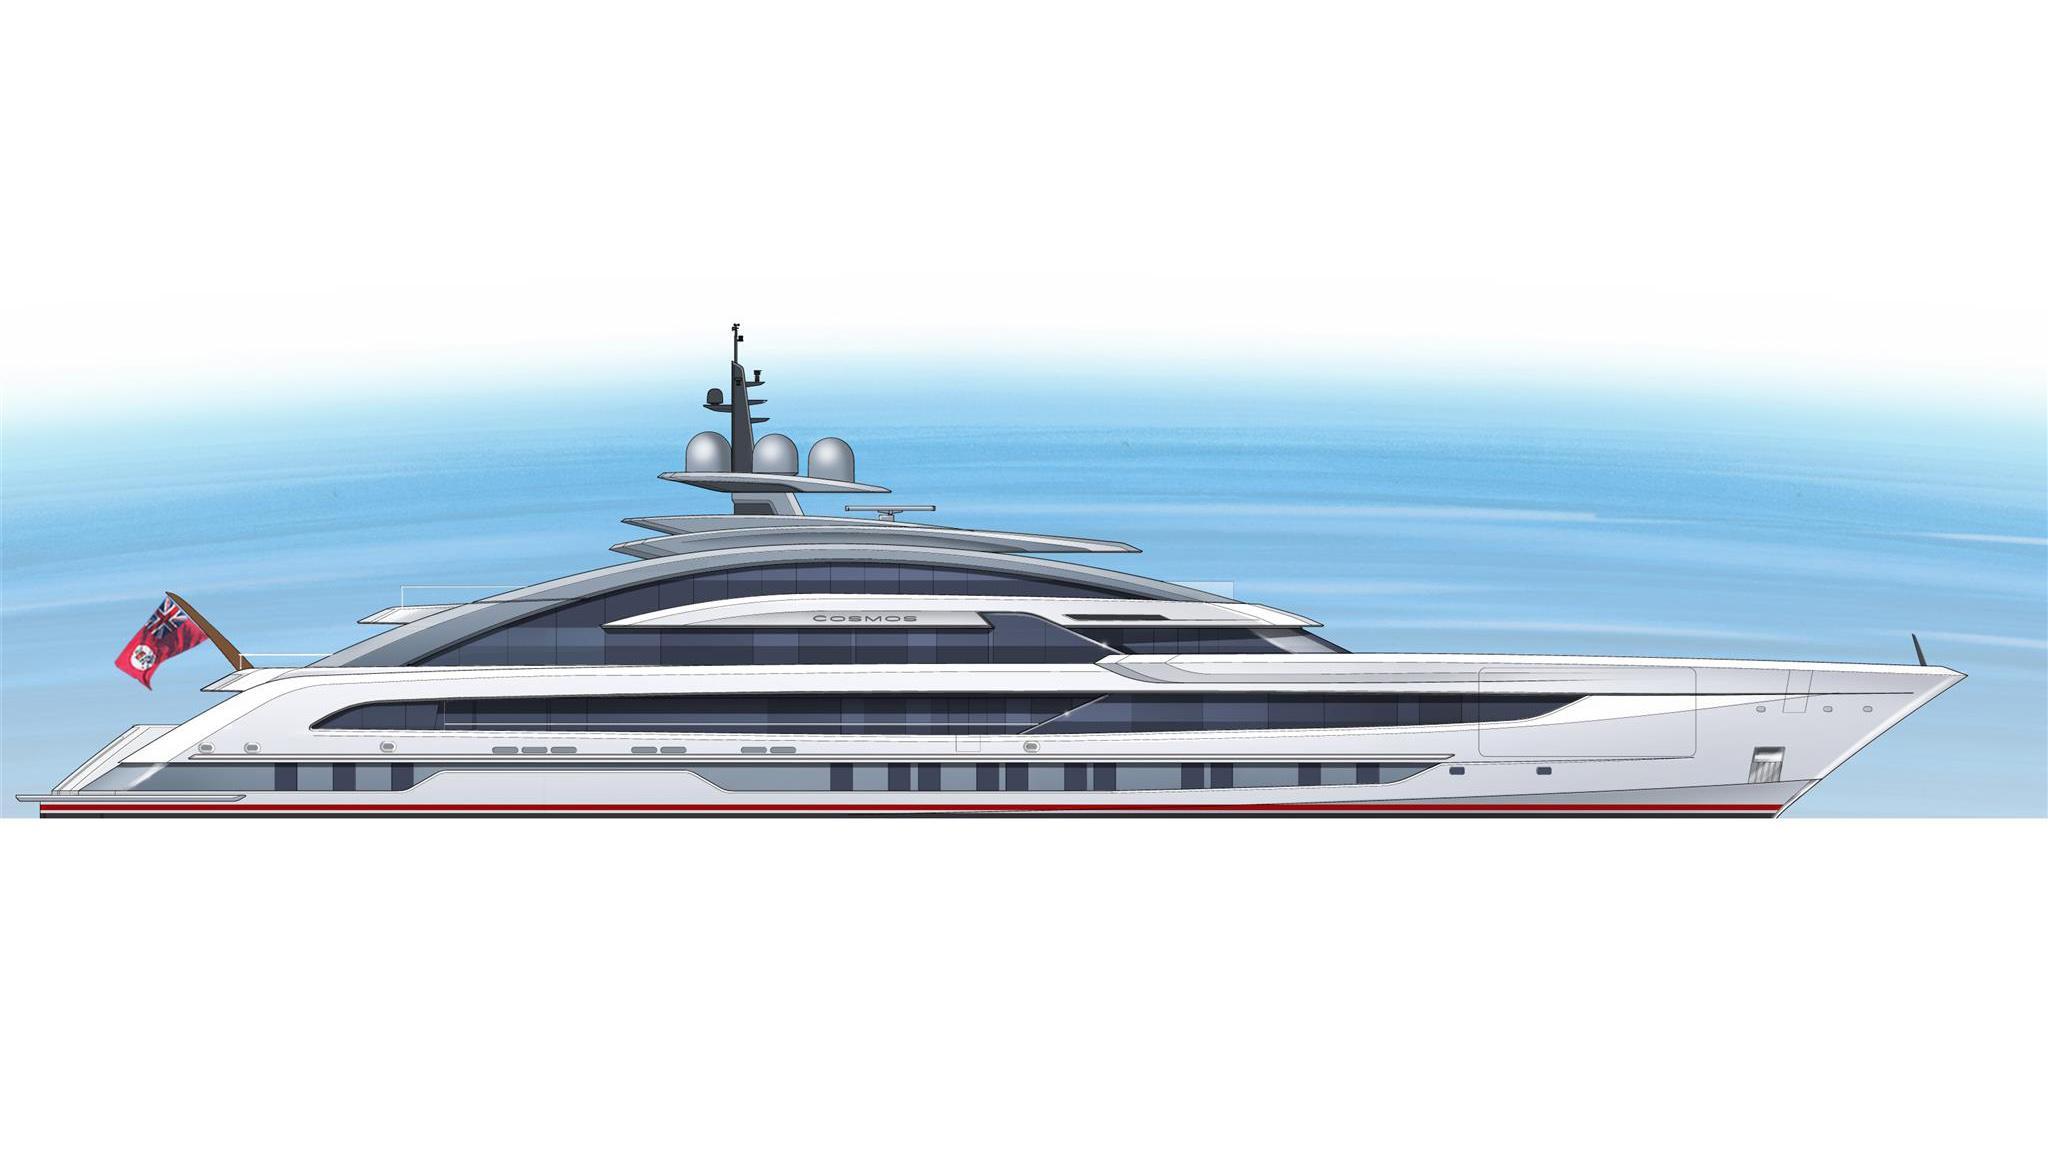 cosmos motoryacht heesen yachts 80m 2022 rendering